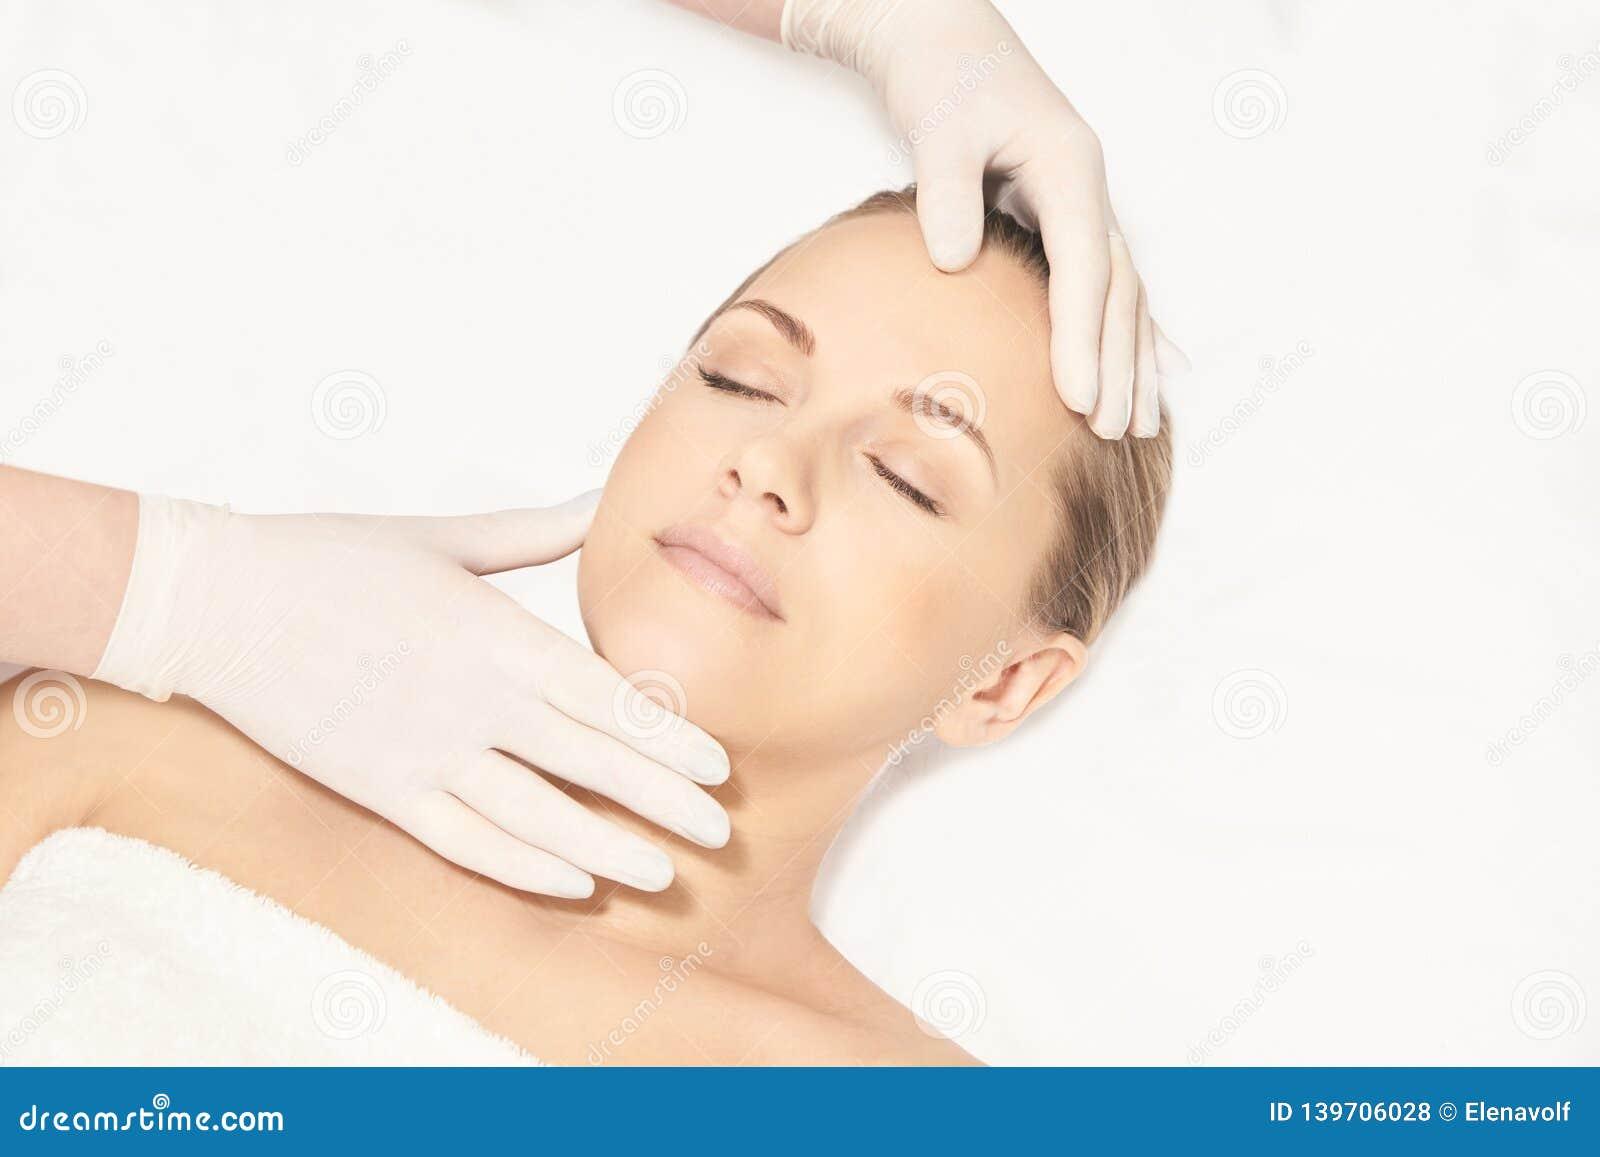 Facial Face Spa Cosmetology Procedure Skin Care Lift Plastic Anti Age Stock Photo Image Of Bowl Liquid 139706028